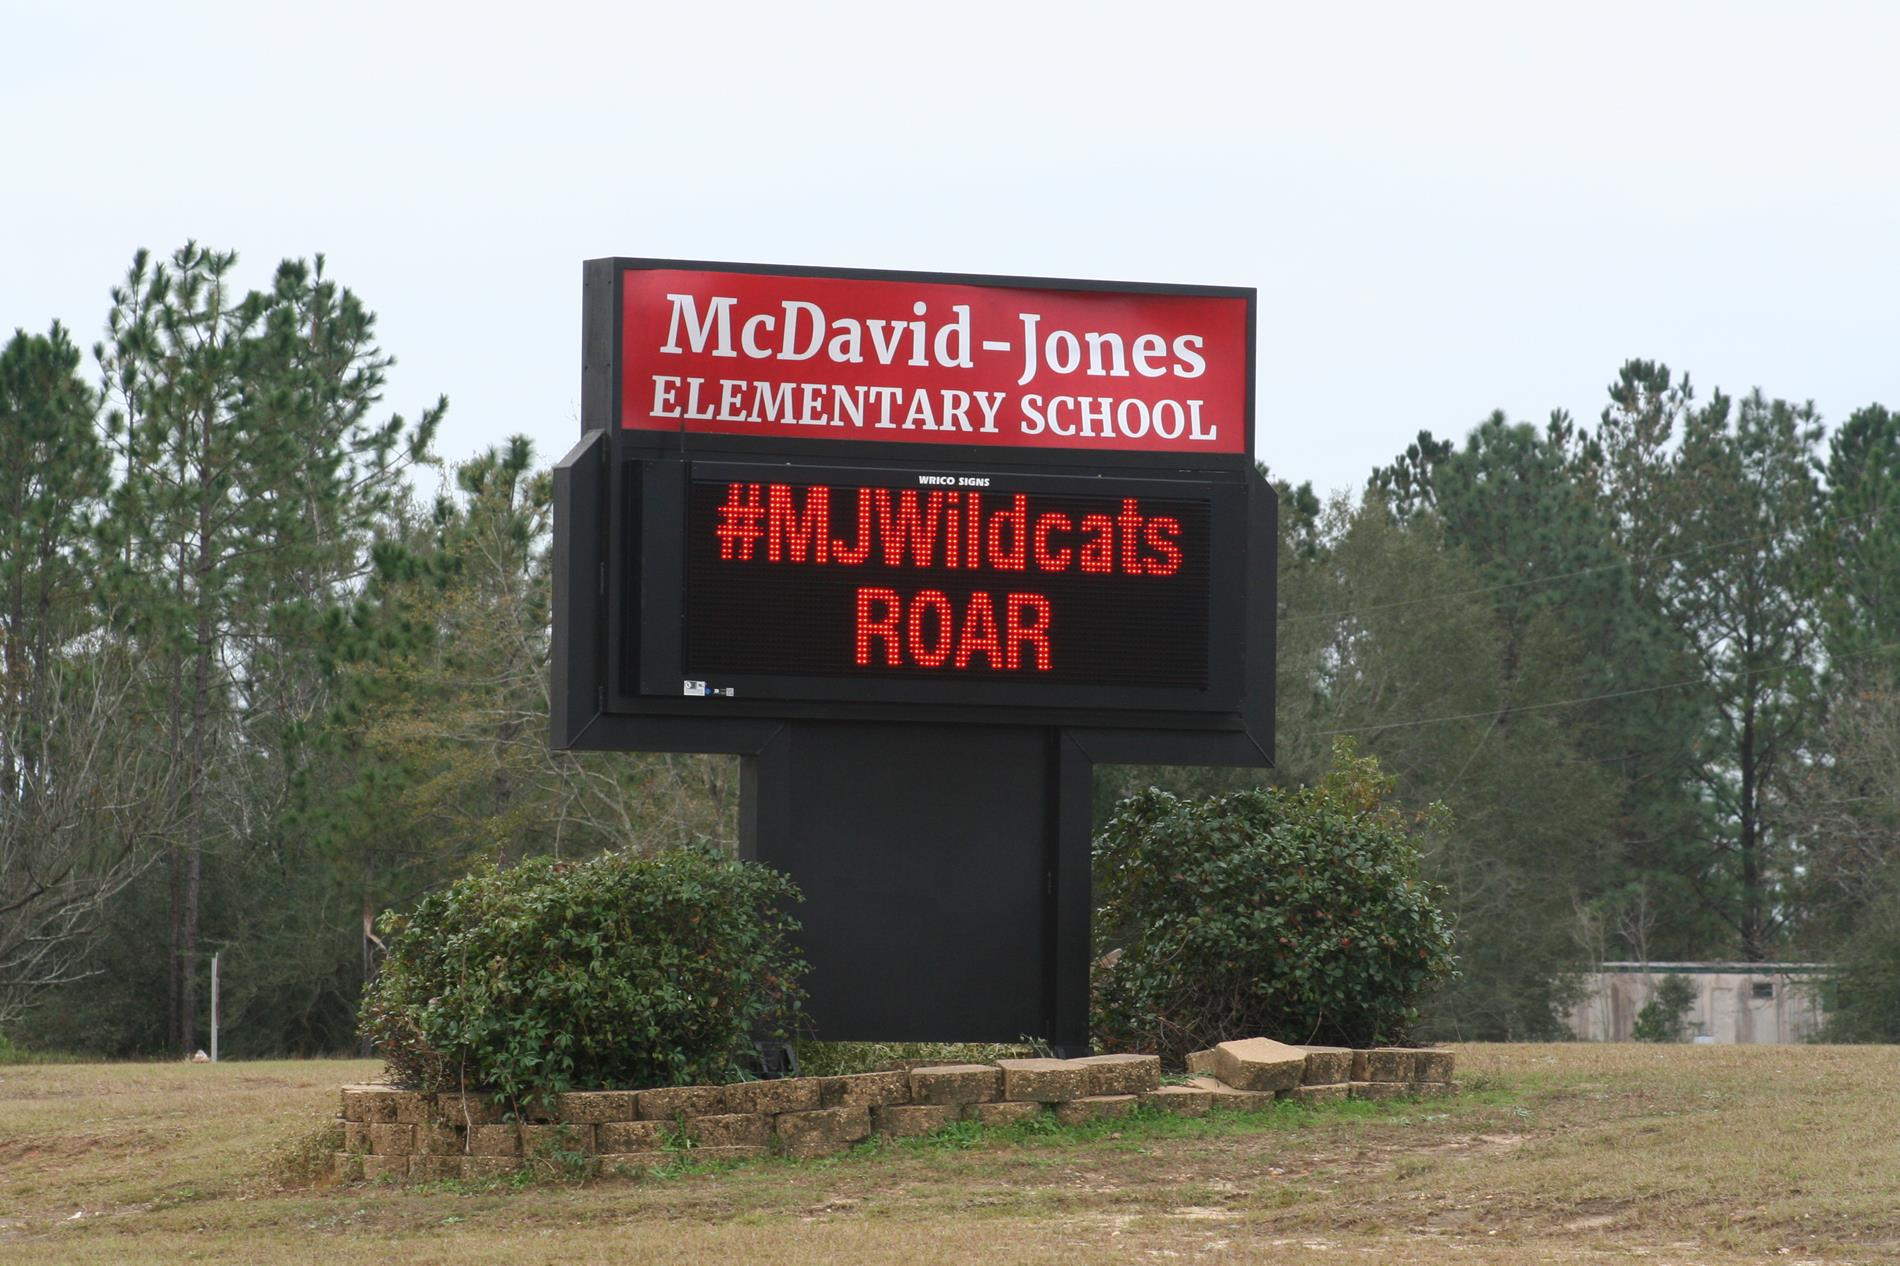 McDavid-Jones Elementary School